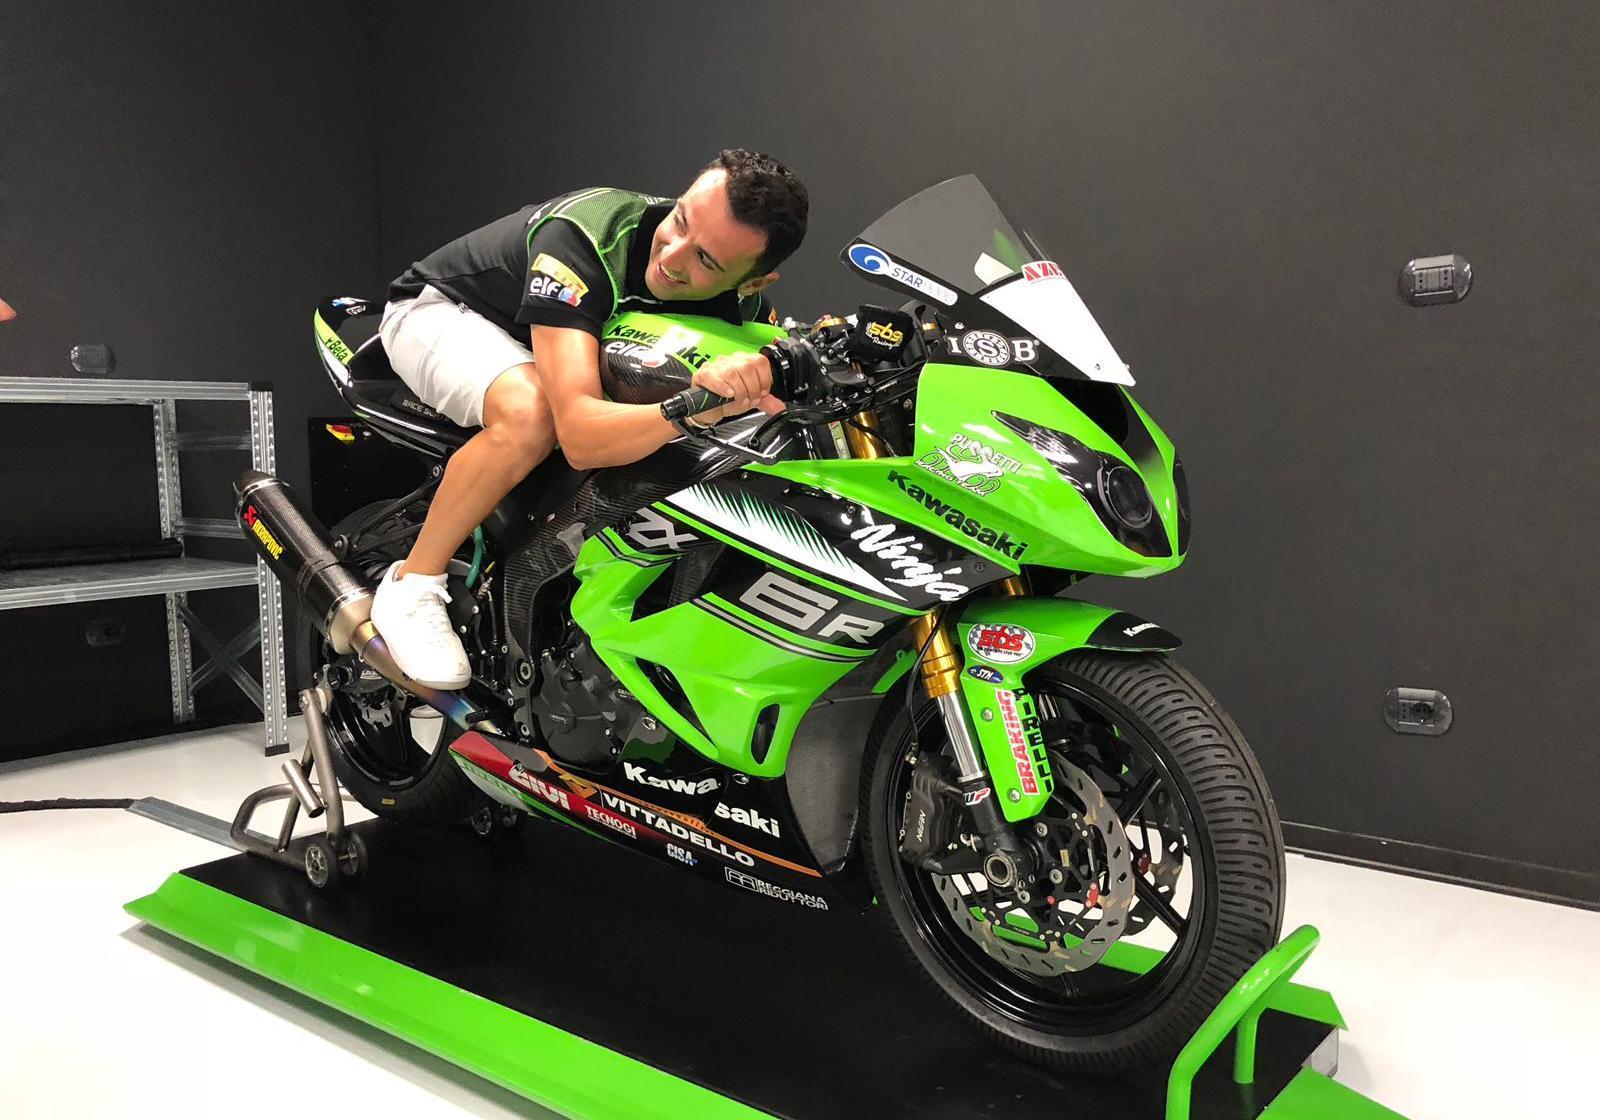 Hector Barbera Joins Kawasaki Puccetti Racing In Worldssp